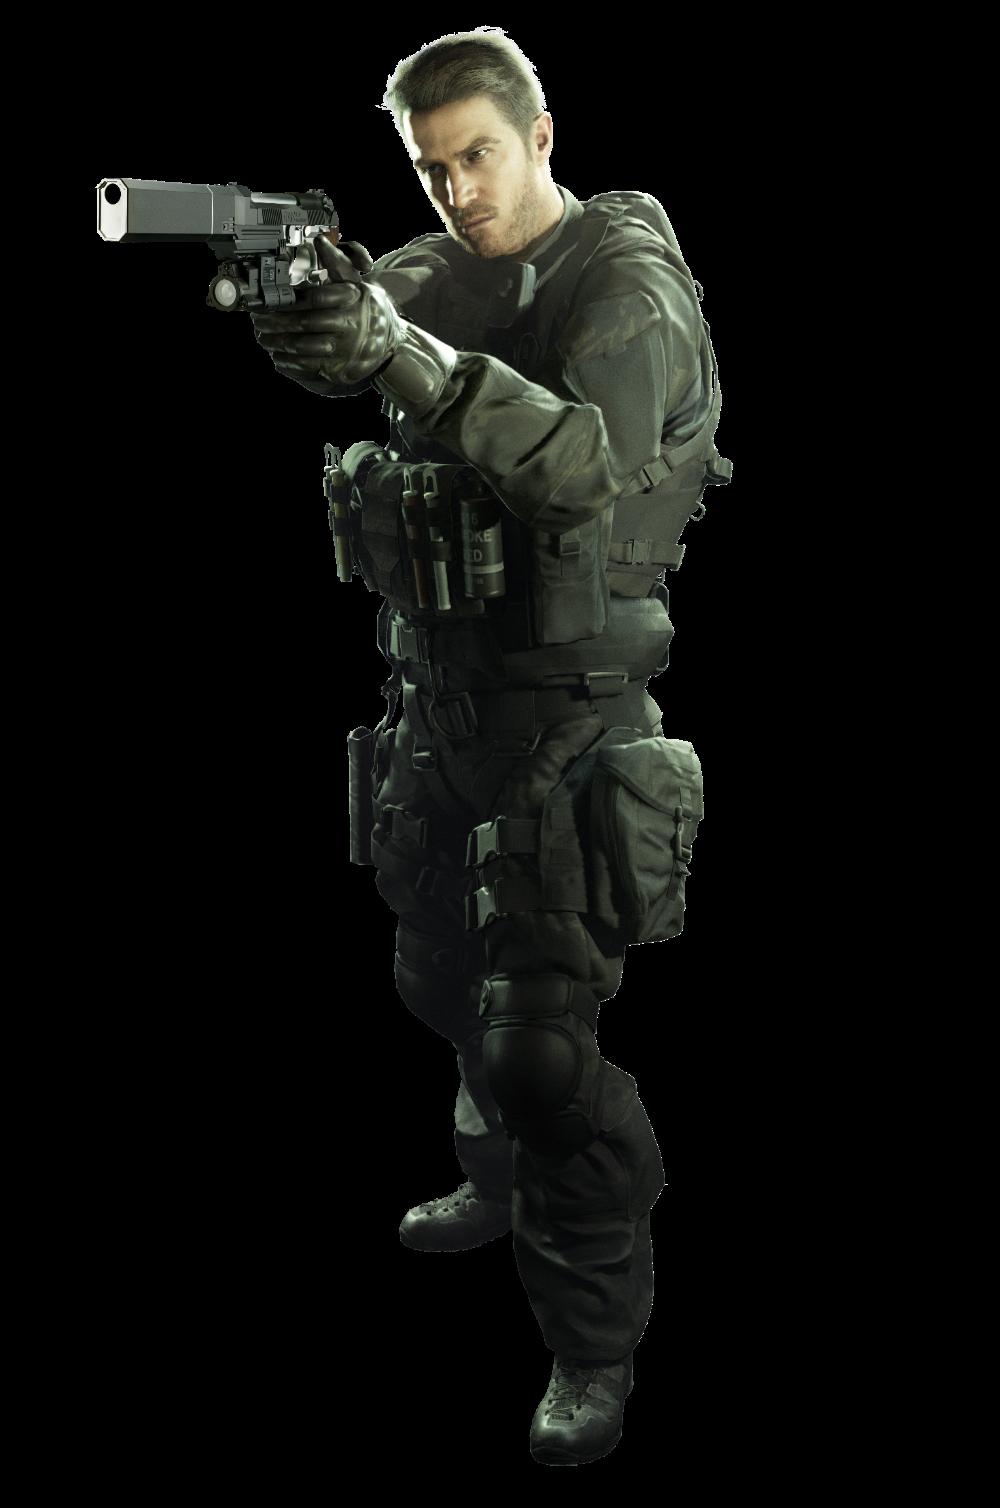 Resident Evil 7 Chris Redfield Ultra Hd Png Render By Muraimustdie On Deviantart Resident Evil Hunk Resident Evil Resident Evil Game